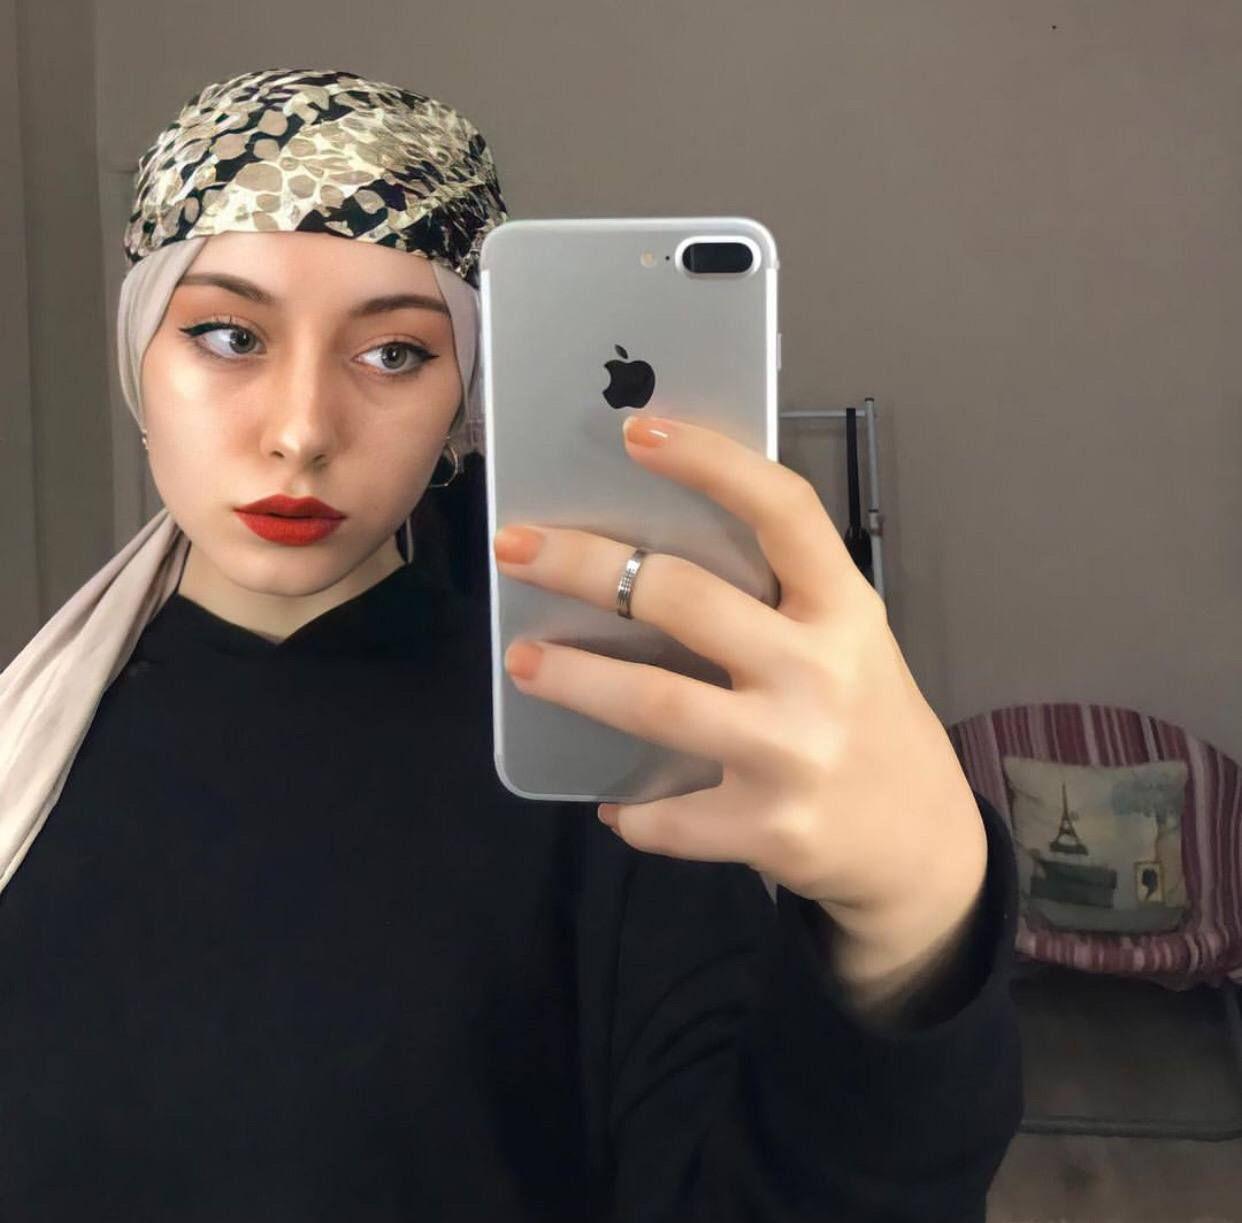 Pin By علي سعد On رمزيات بنات محجبات In 2021 Popsockets Phone Cases Phone